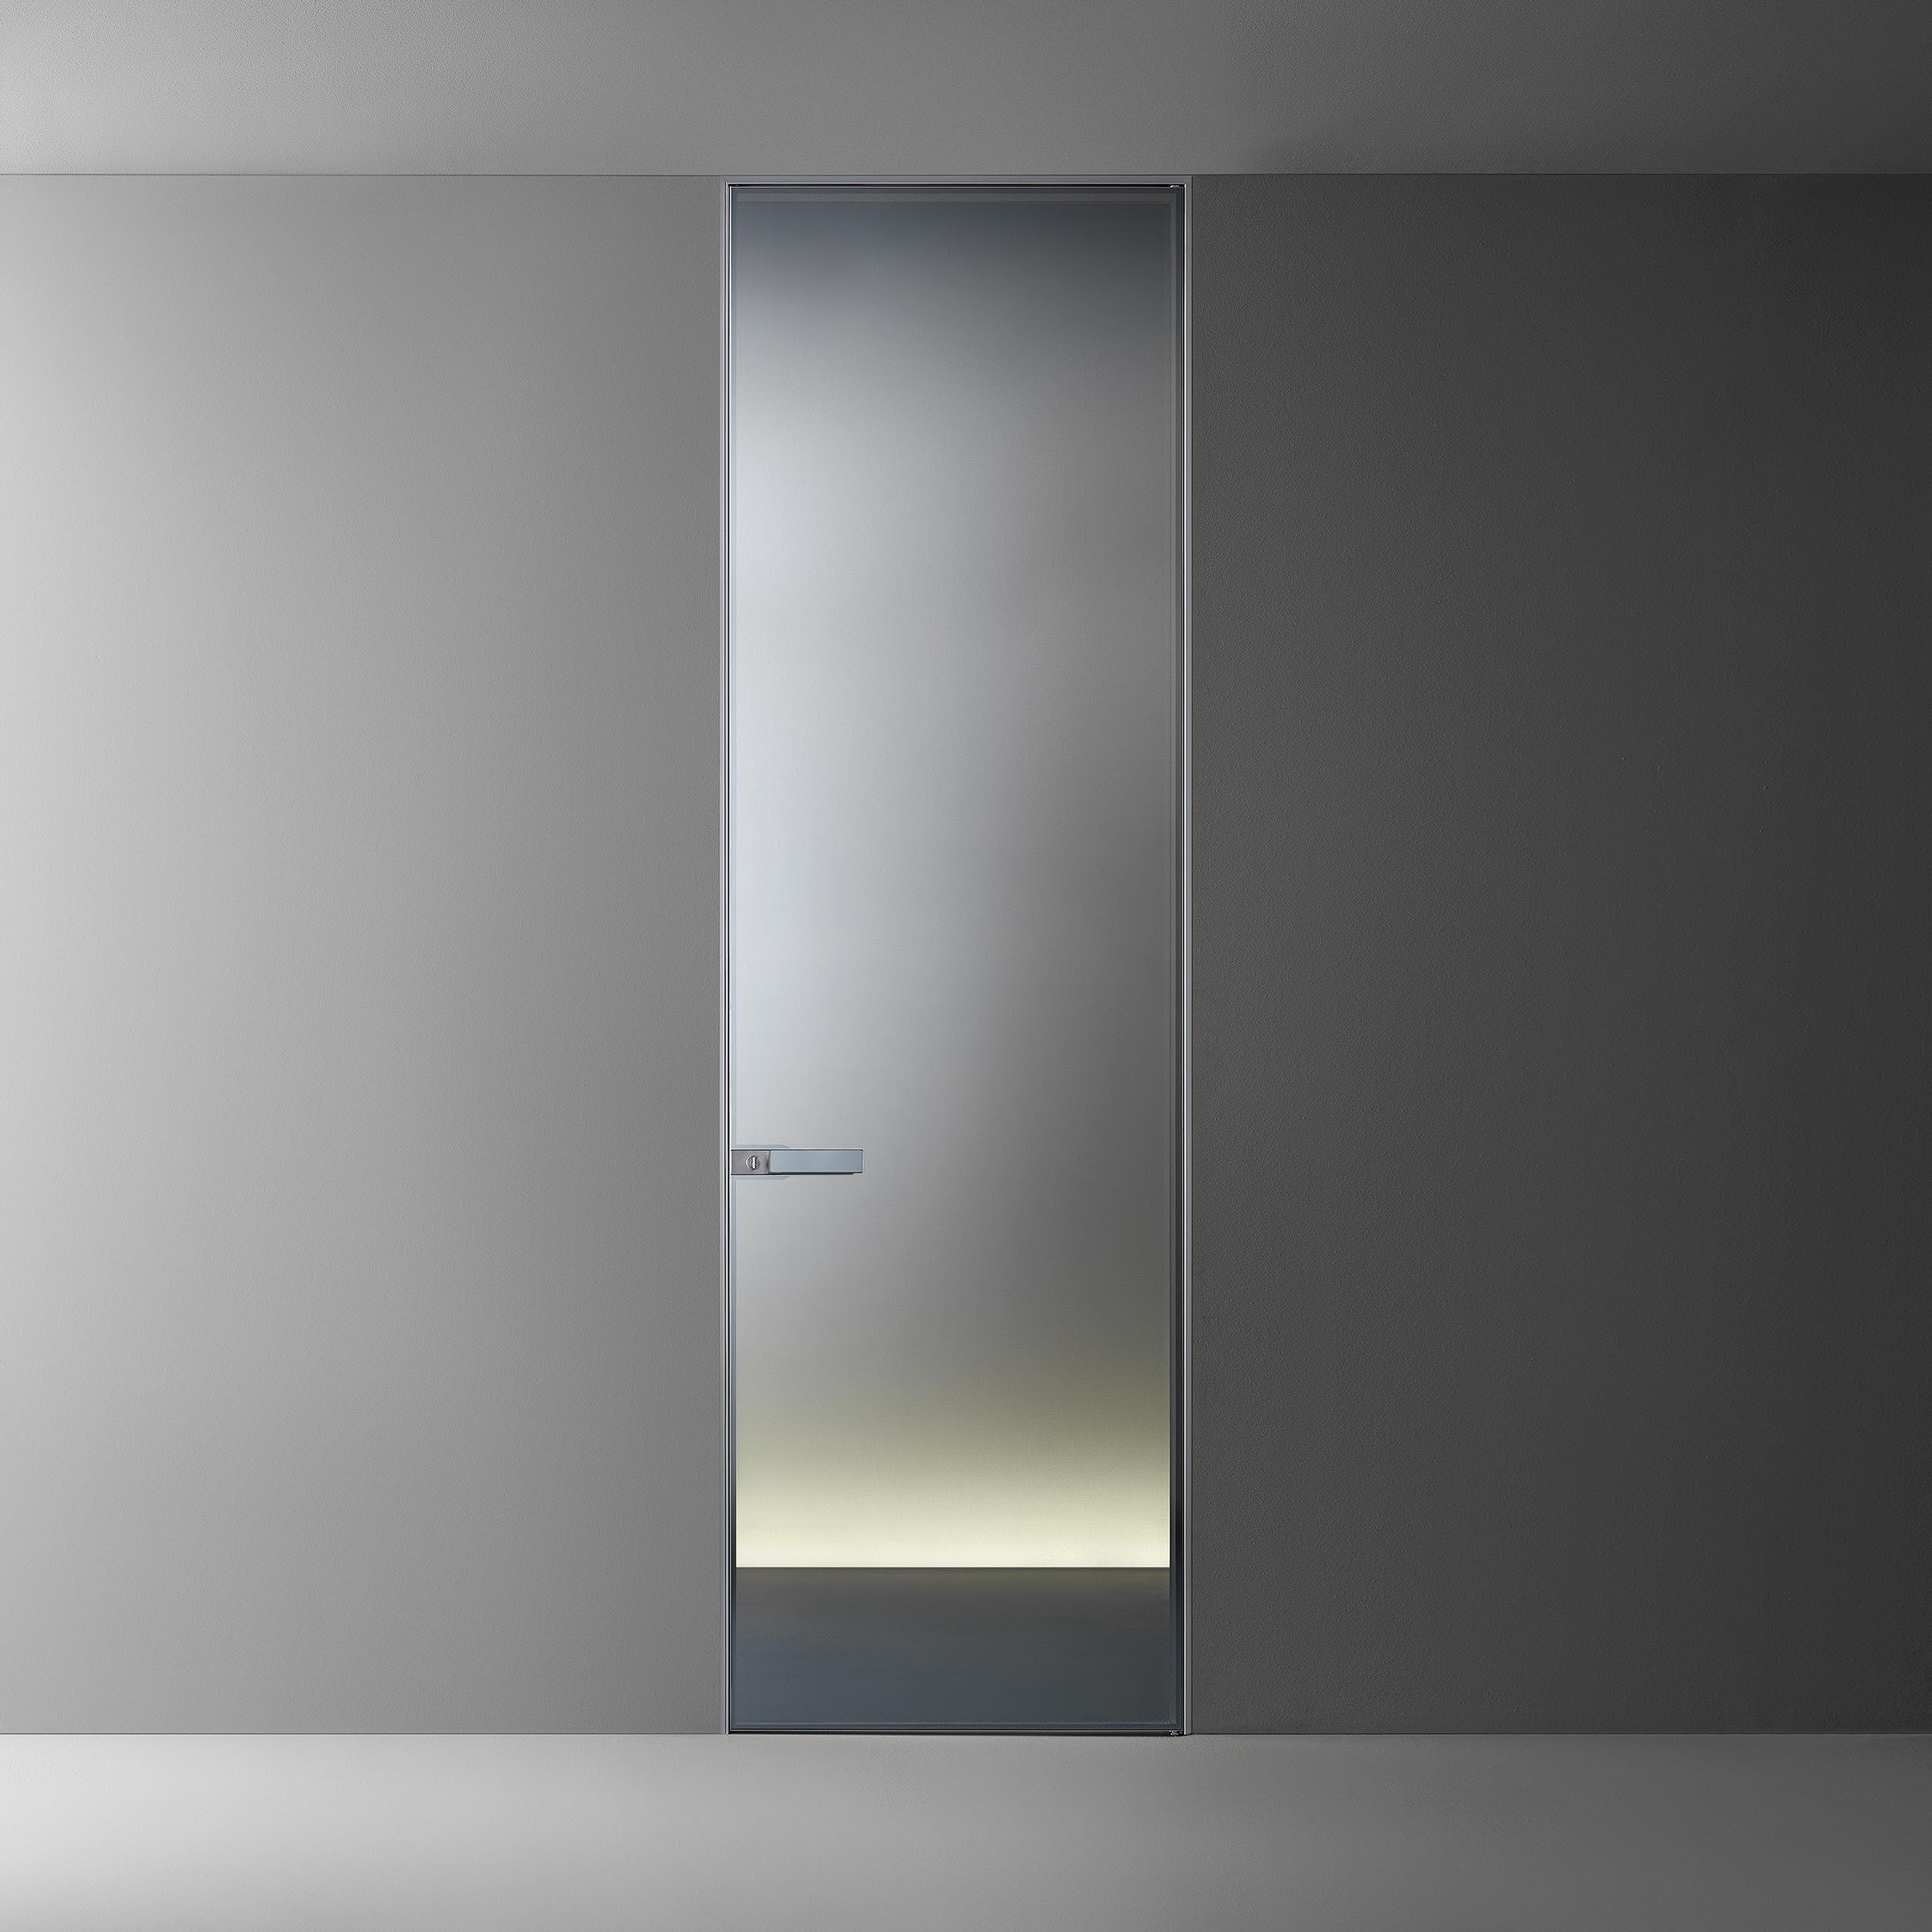 Rimadesio Moon Door Rimadesio Tall Cabinet Storage Interior Architecture